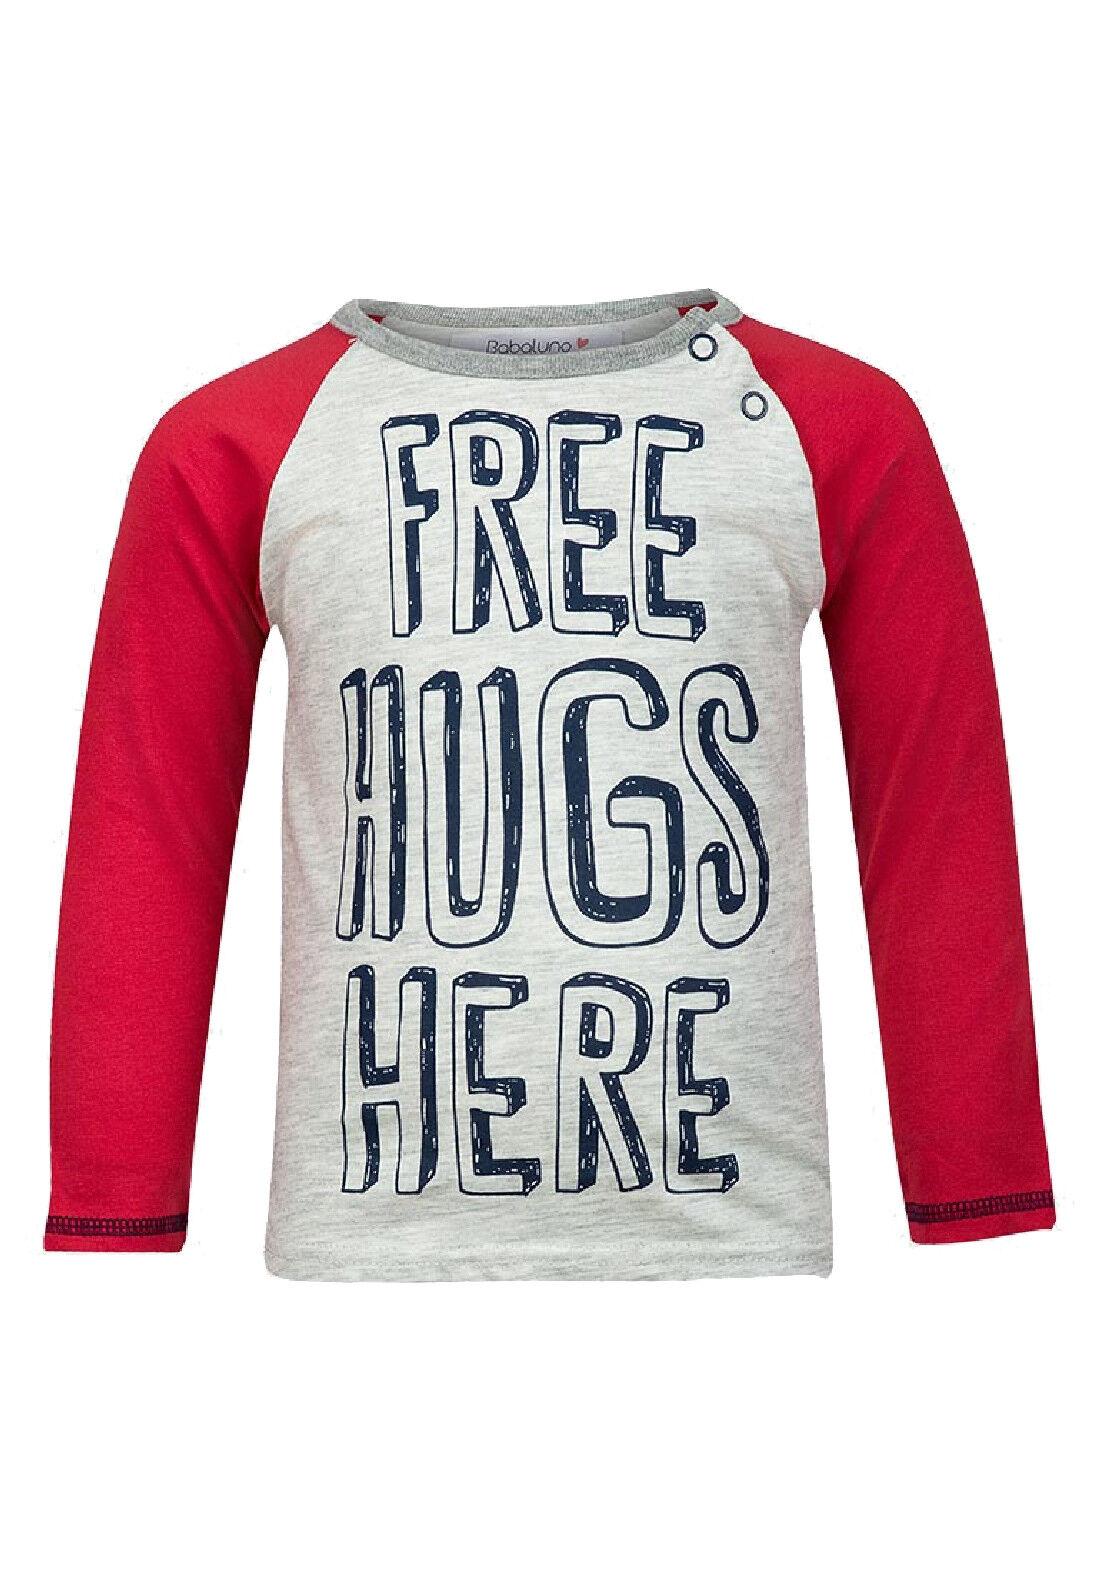 Babaluno Boys Free Hugs T-Shirt